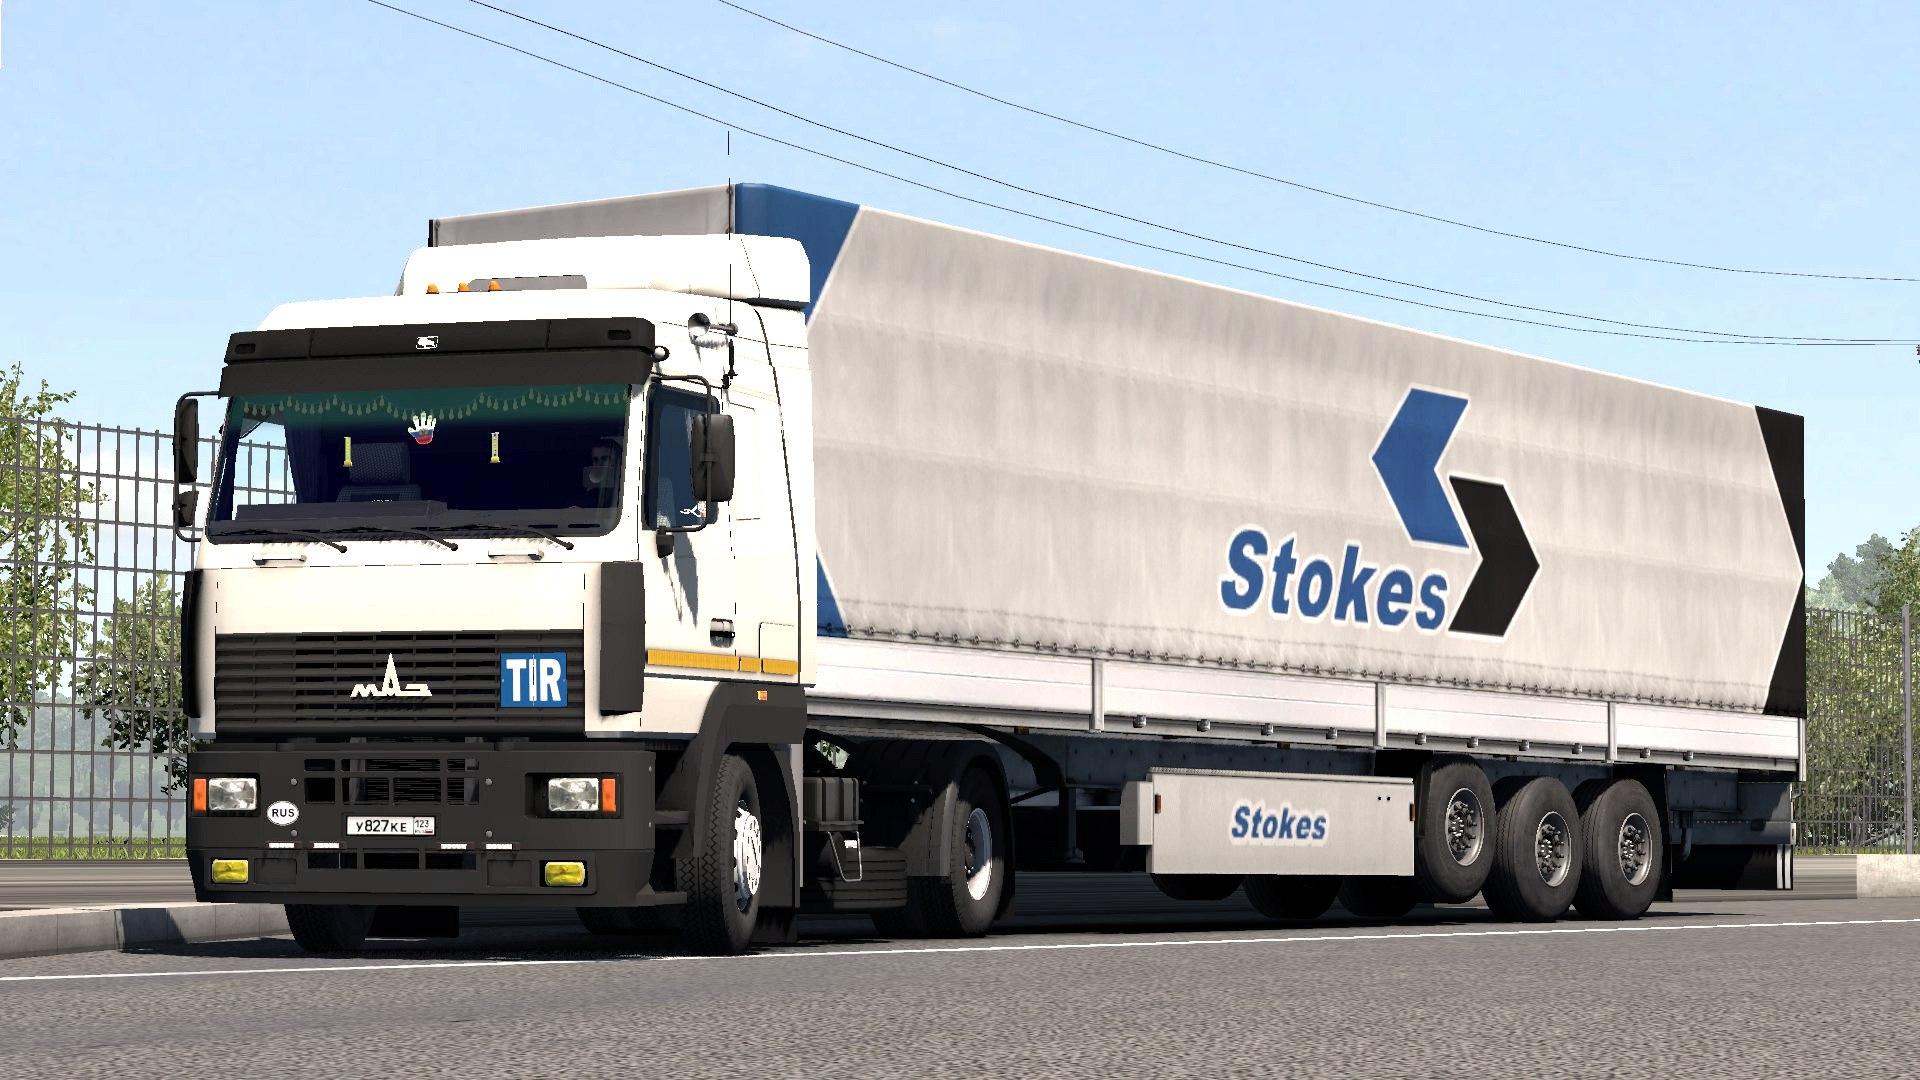 9IpMnrgboZk.jpg - Euro Truck Simulator 2